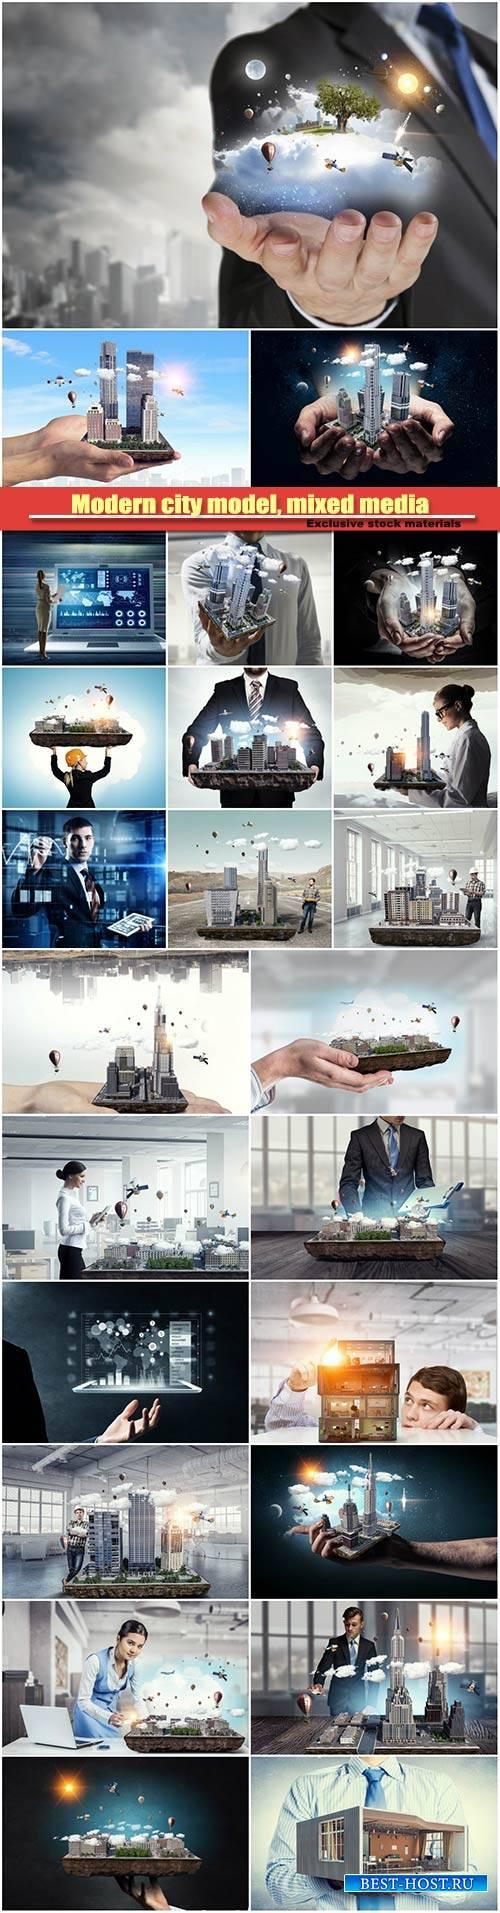 Modern city model, mixed media, new development project